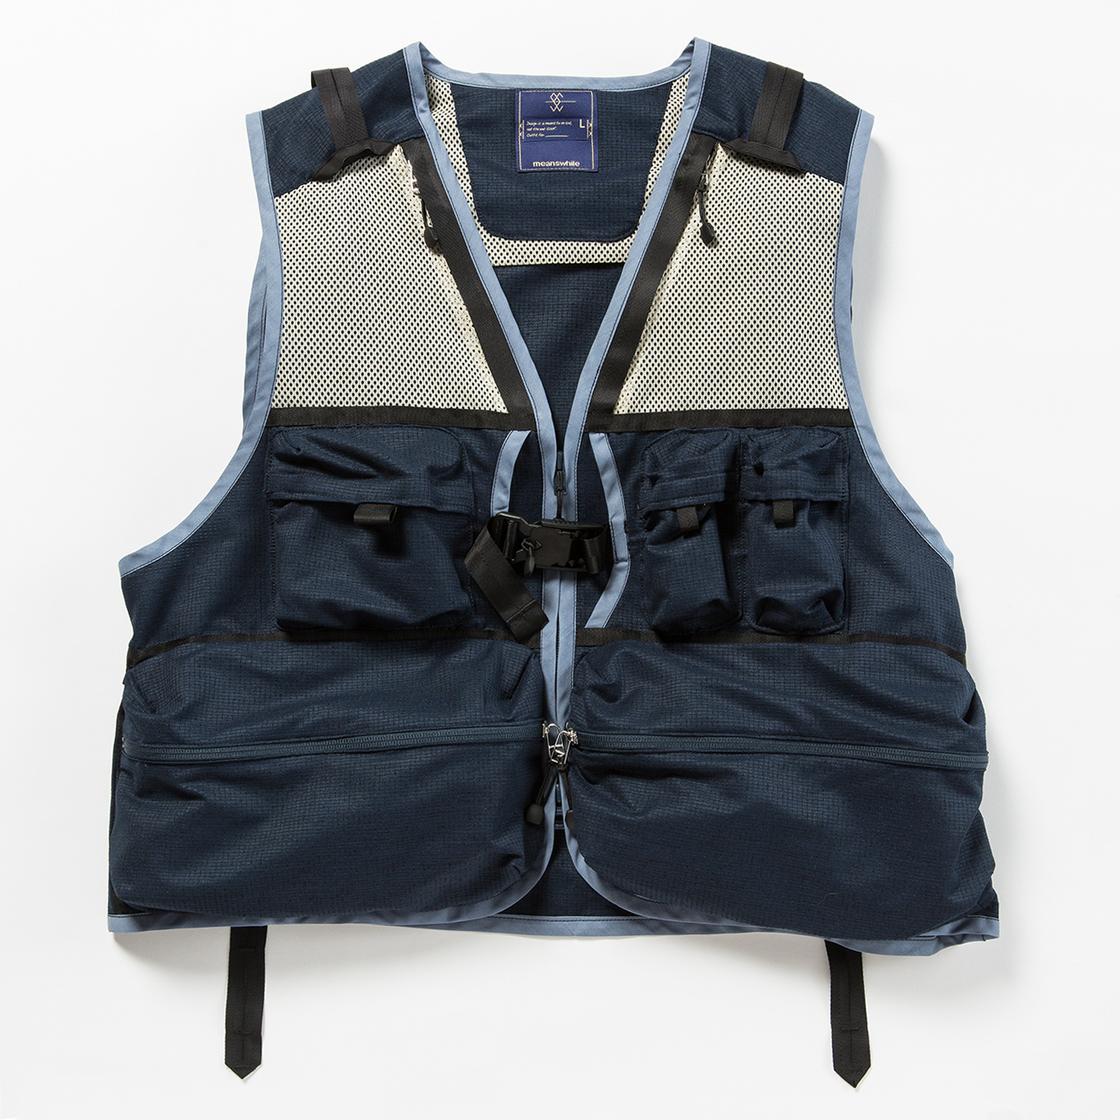 Dry Mesh Luggage Vest